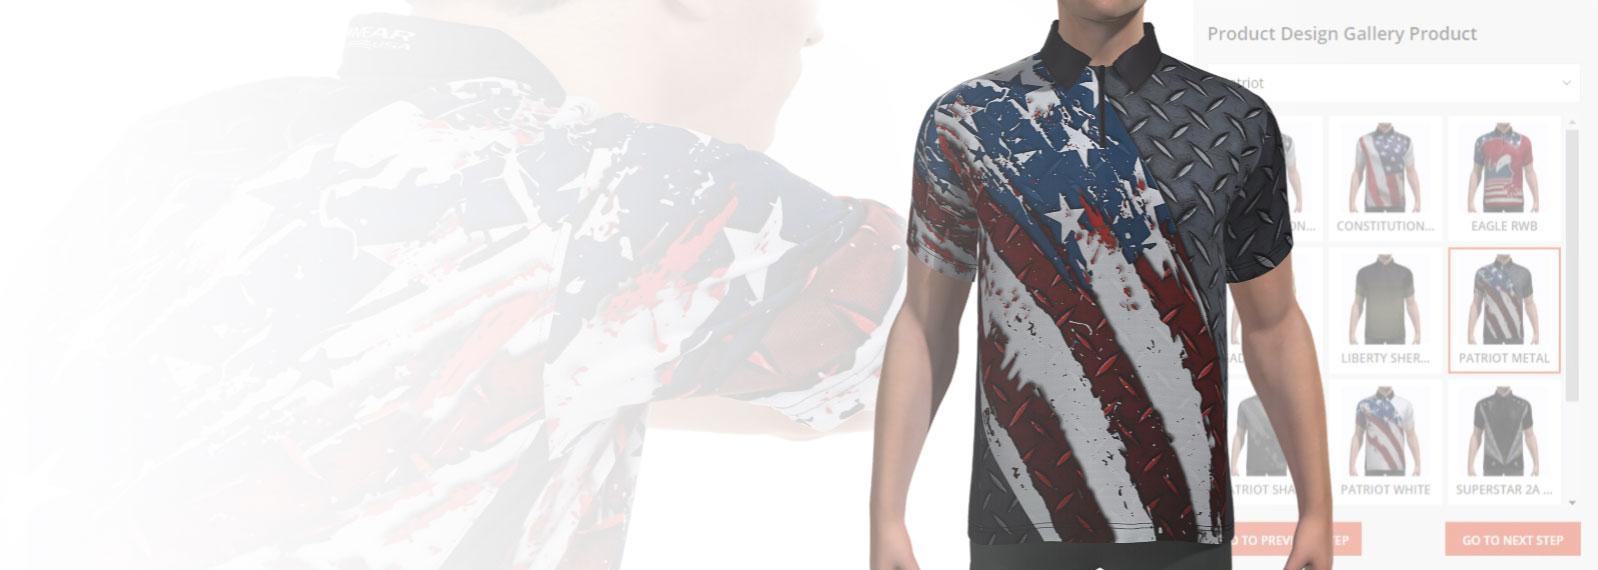 0f4761f7 WELCOME TO TECHWEAR USA NEW Custom Product Designer Customize your favorite  TechWearUSA gear using our new Product Designer Featuring Camo & Patriotic  ...